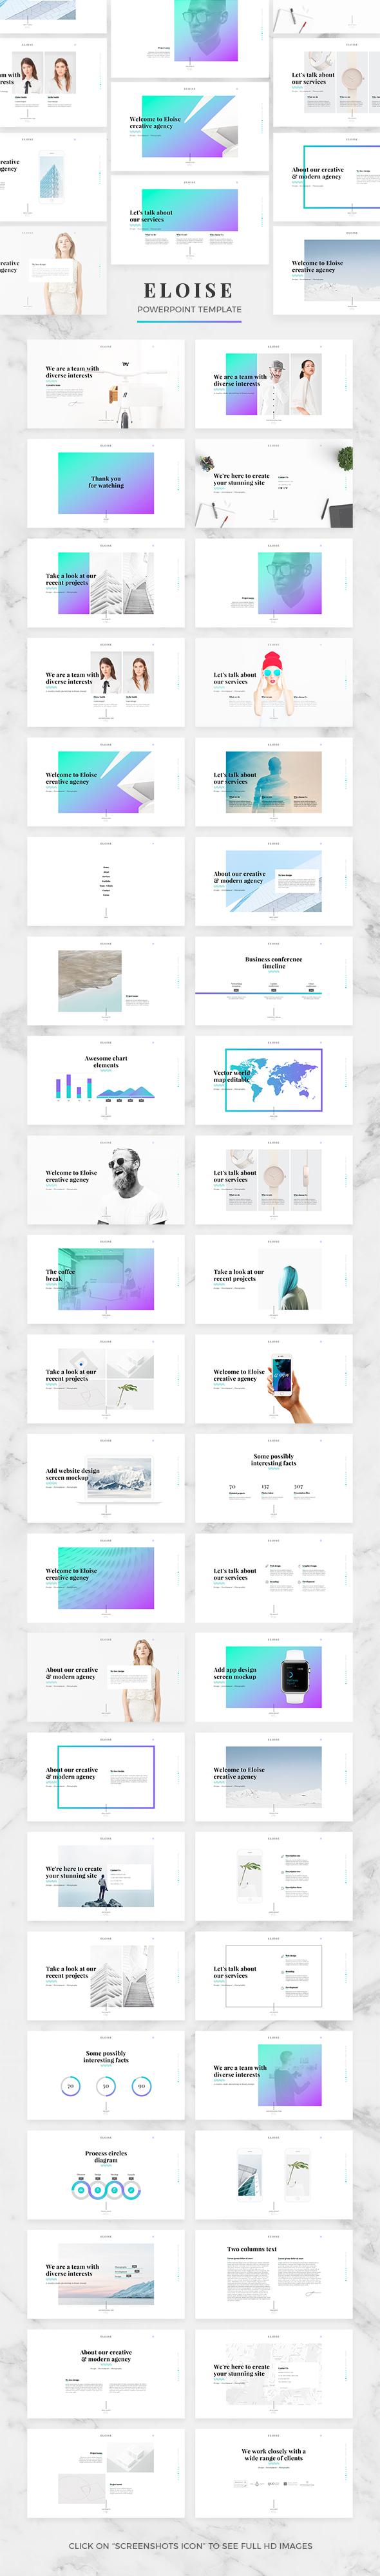 Eloise - Creative PowerPoint Template - Creative PowerPoint Templates